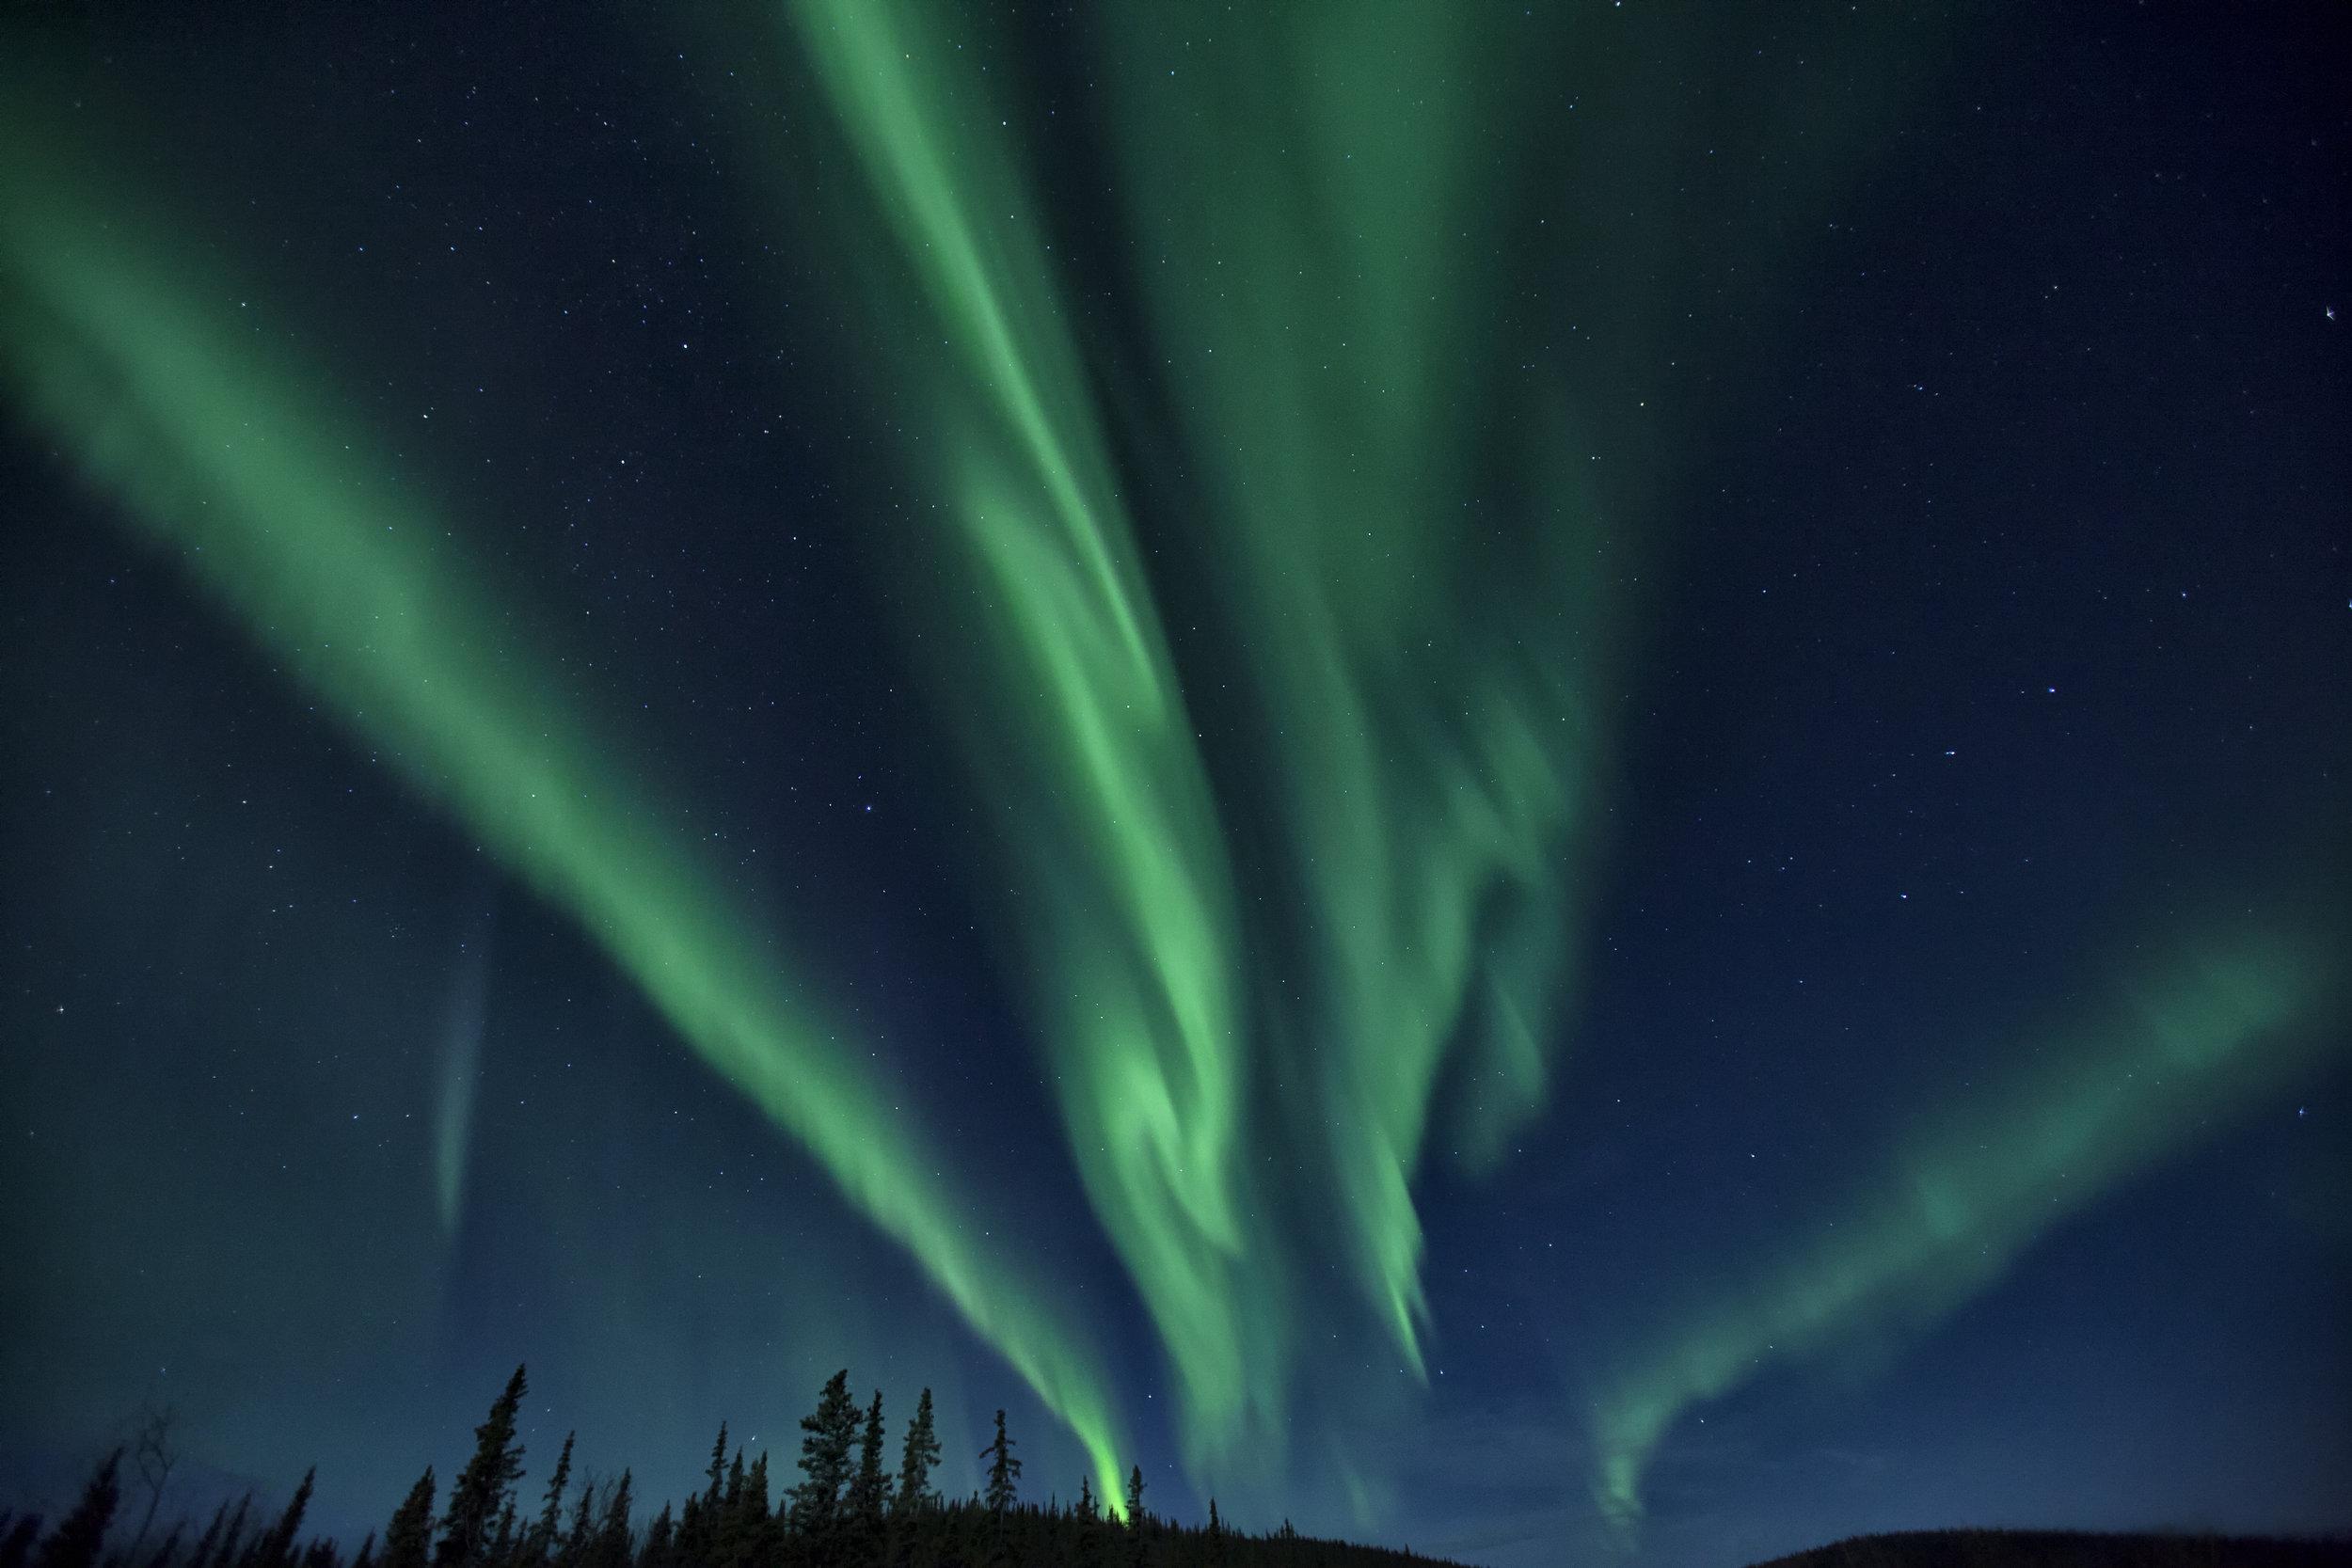 Yukon Northern Lights - Across the Blue Planet